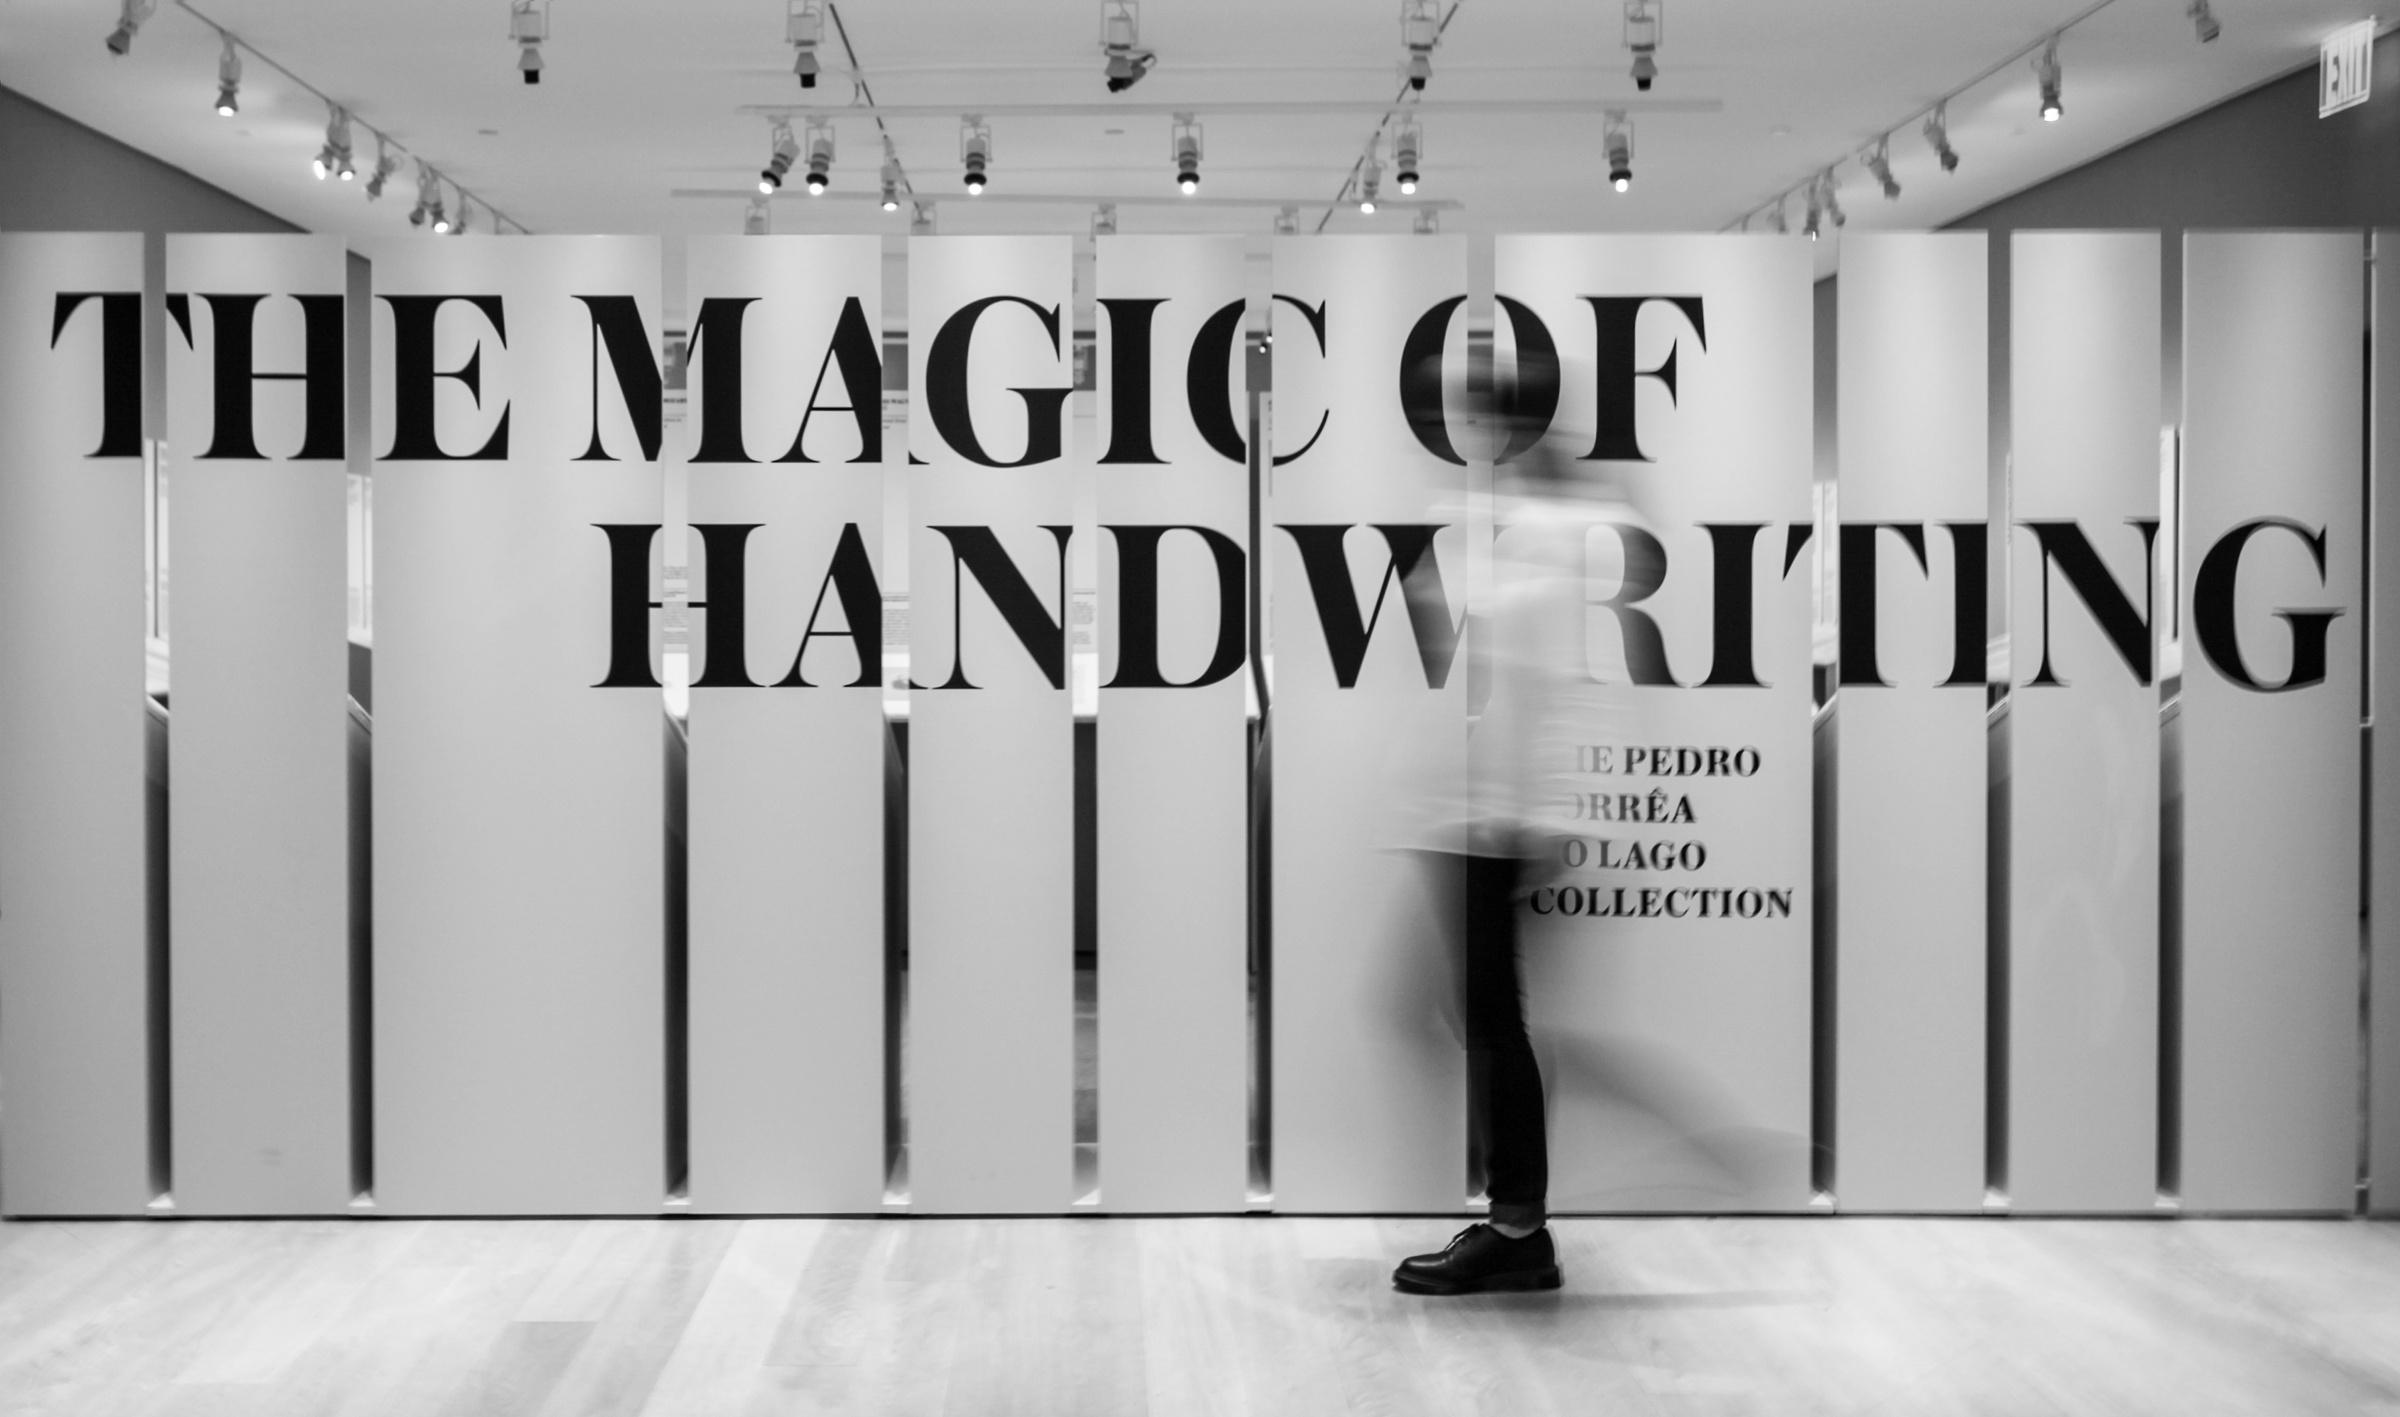 The Magic of Handwriting: The Pedro Corrêa do Lago